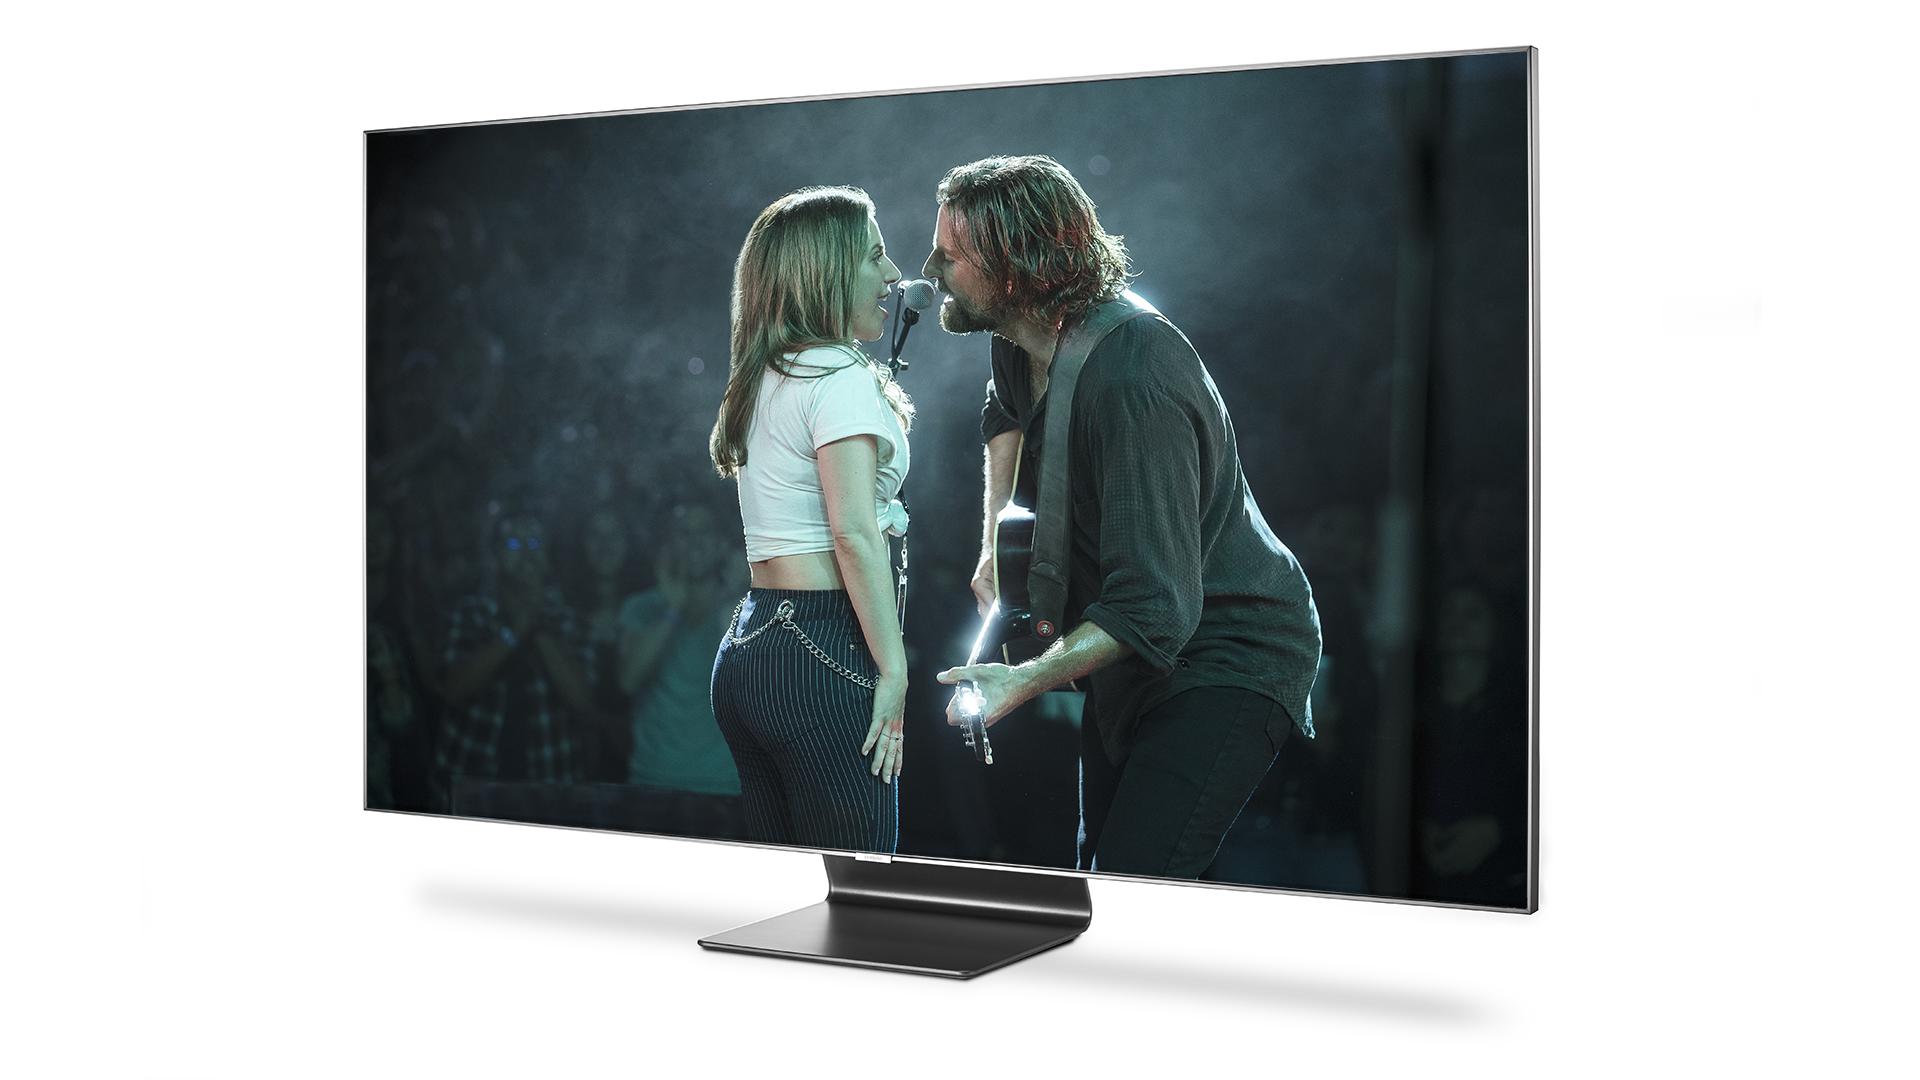 5d368f957d76 Best Samsung TVs 2019: budget, premium, QLED, 4K, 8K | What Hi-Fi?